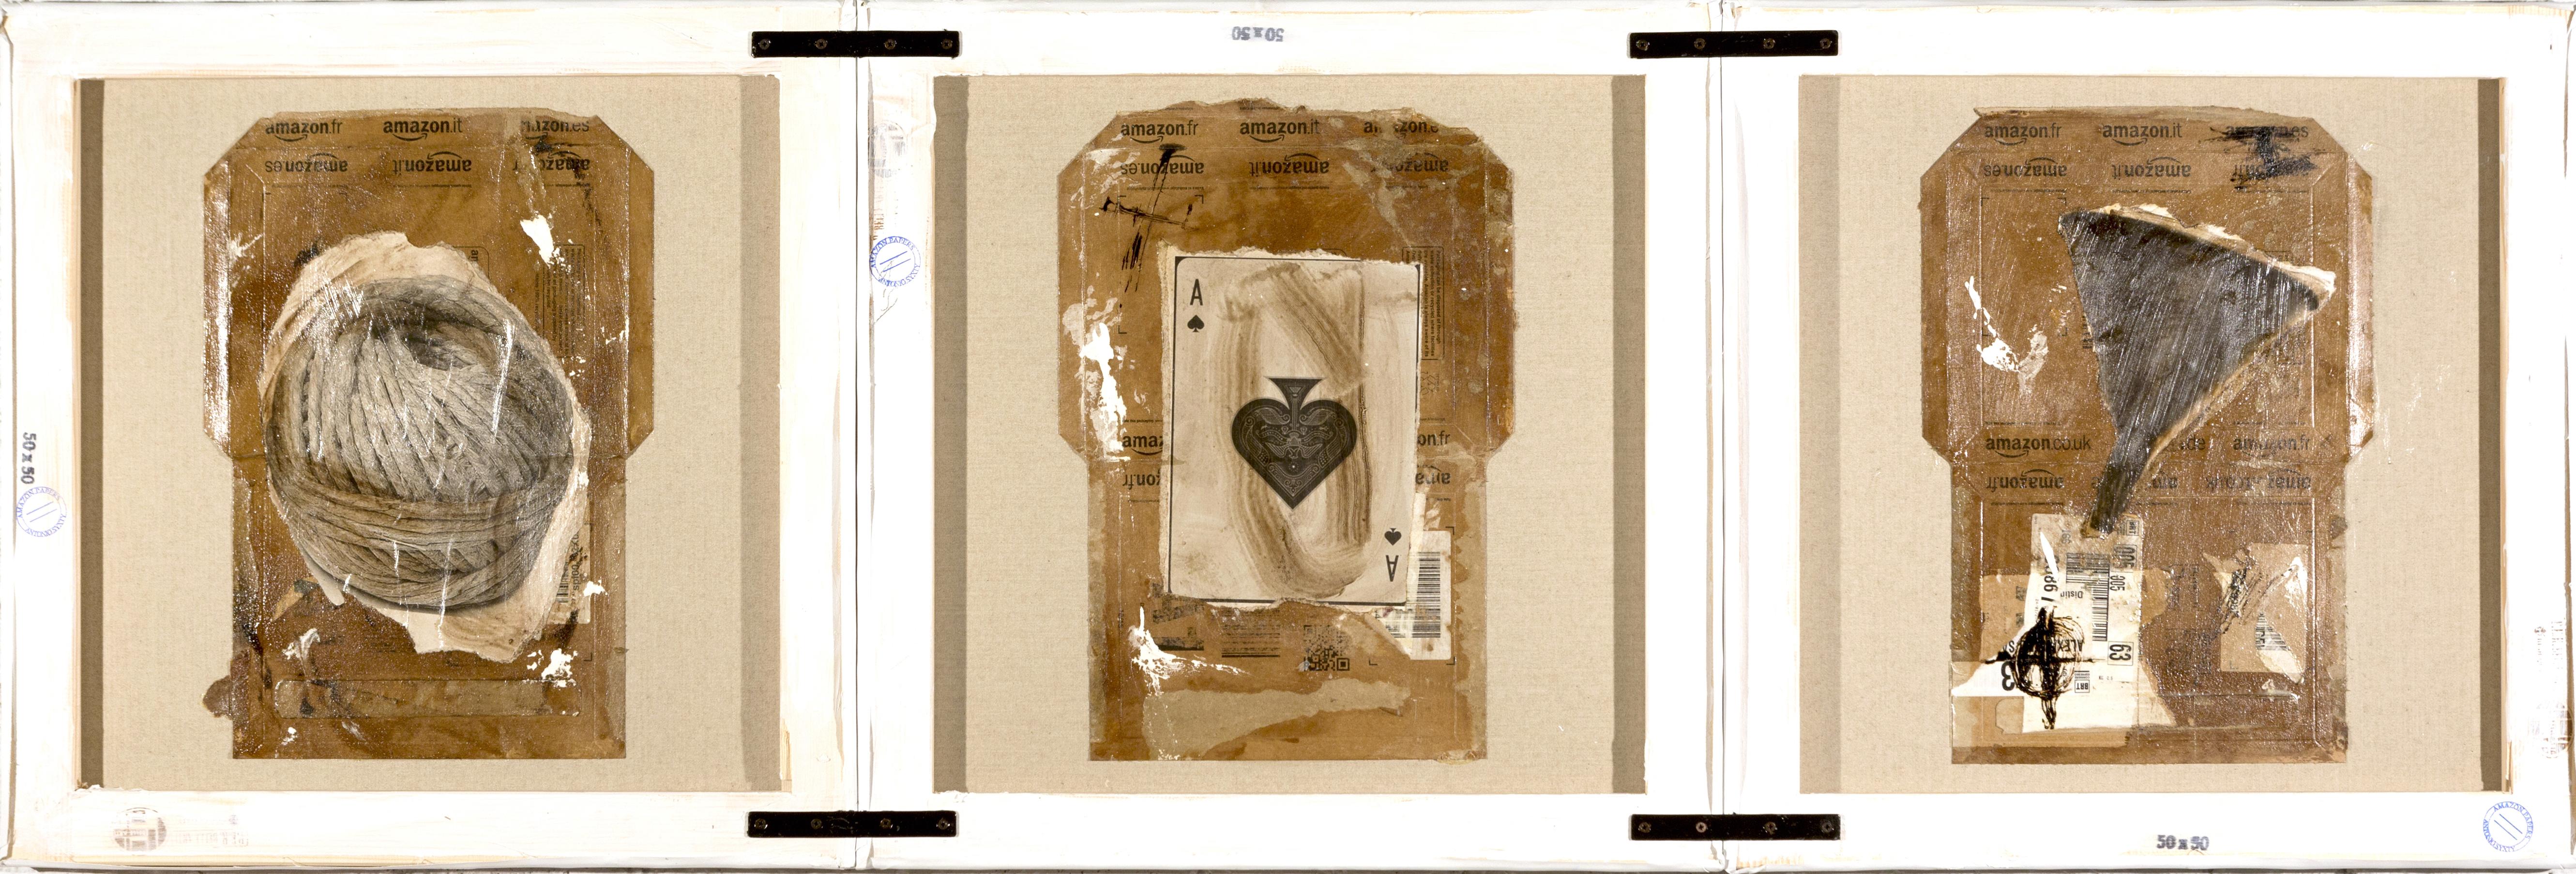 AP Ec 2_17-19, 2015, tecnica mista, cartone su 3 tele rovesciate e assemblate, cm 50 x 150